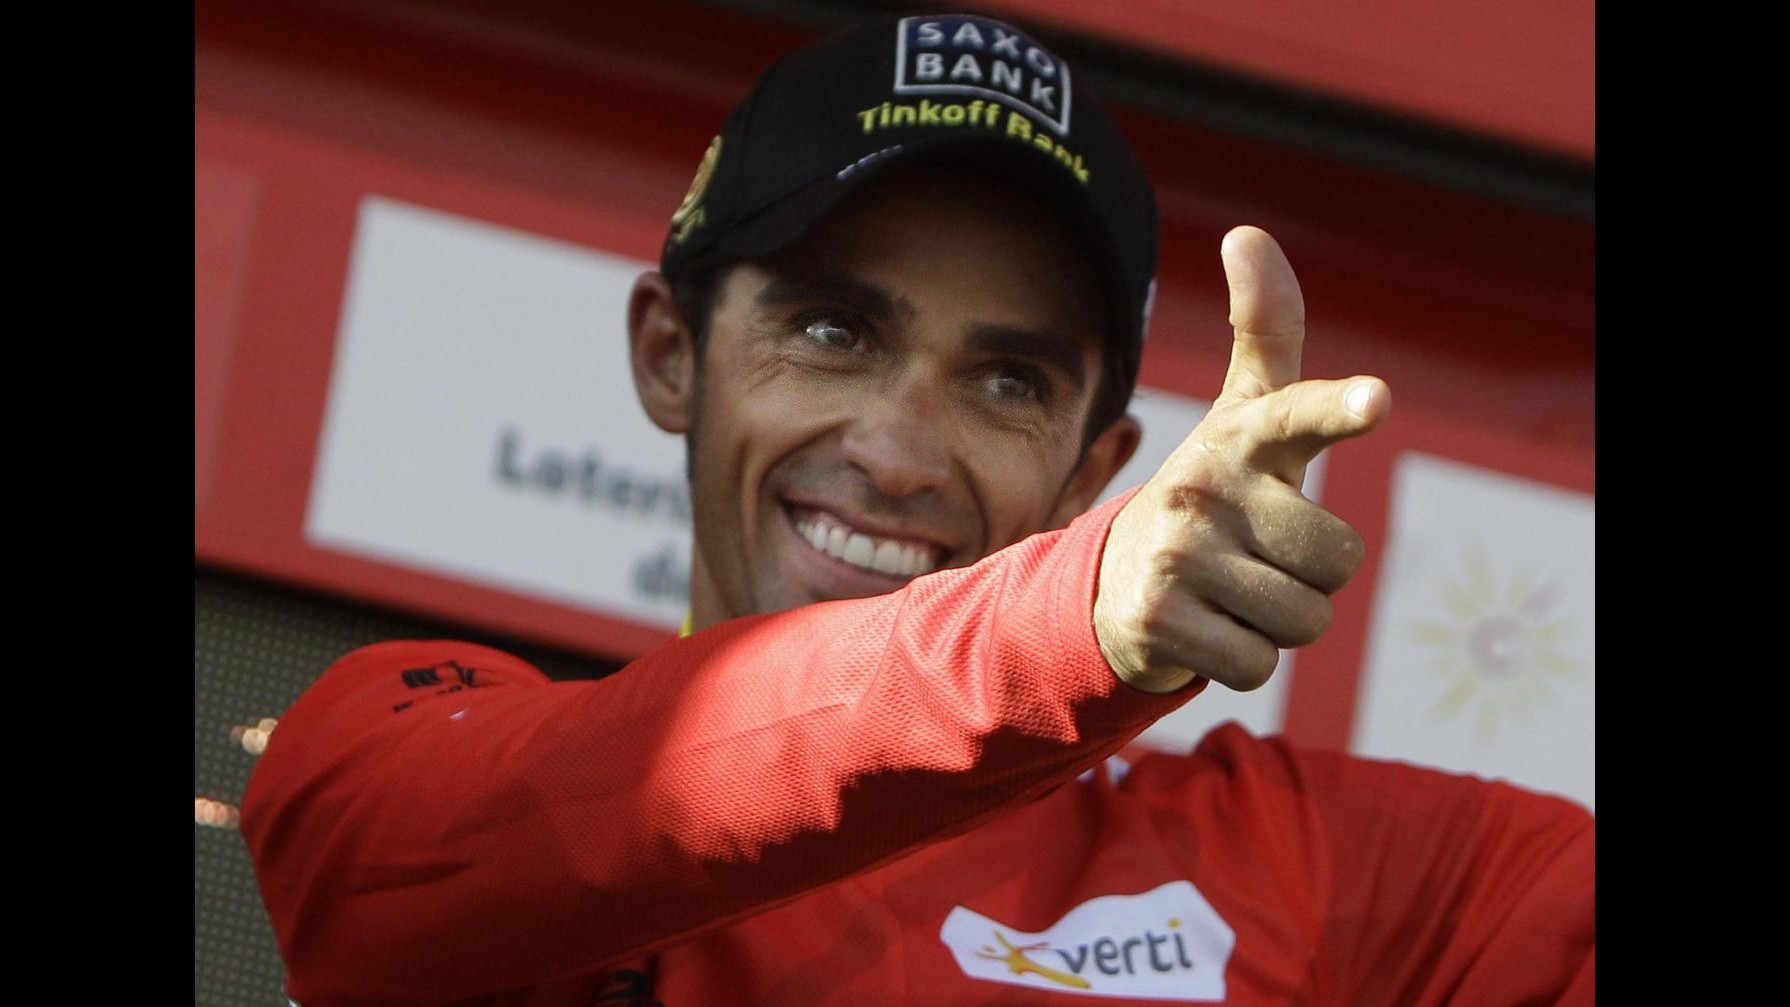 Ciclismo, Contador trionfa alla Vuelta ultima tappa a Degenkolb